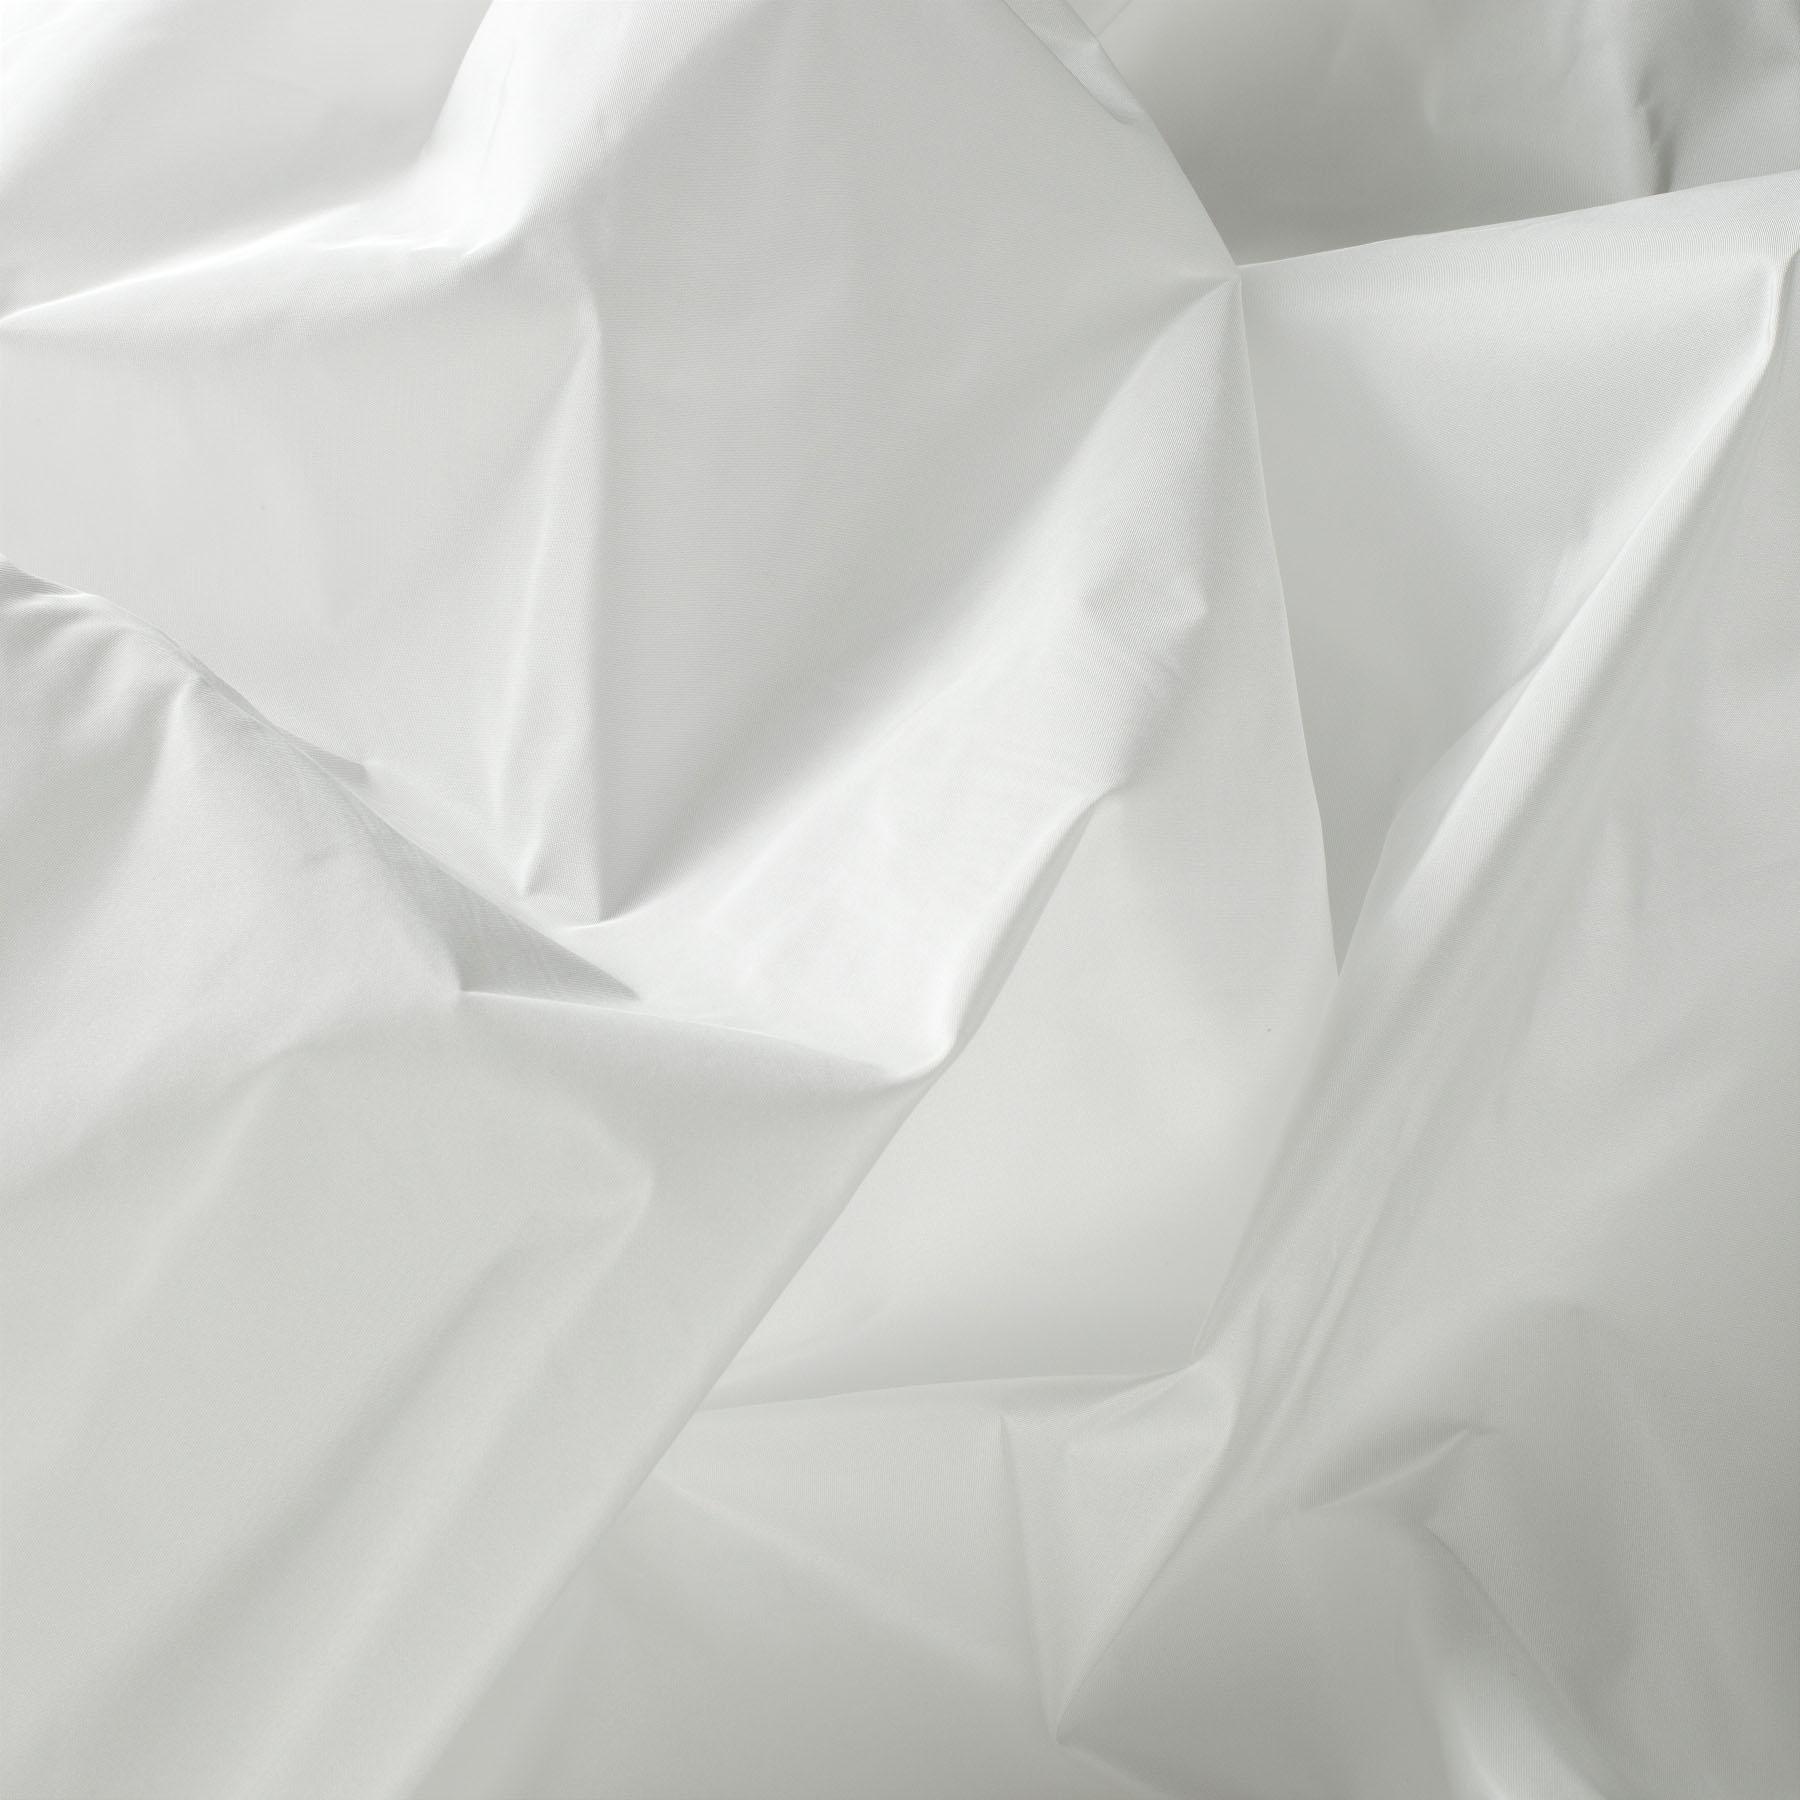 decoration fabric saba vol 3 1 6206 195 jab anstoetz. Black Bedroom Furniture Sets. Home Design Ideas